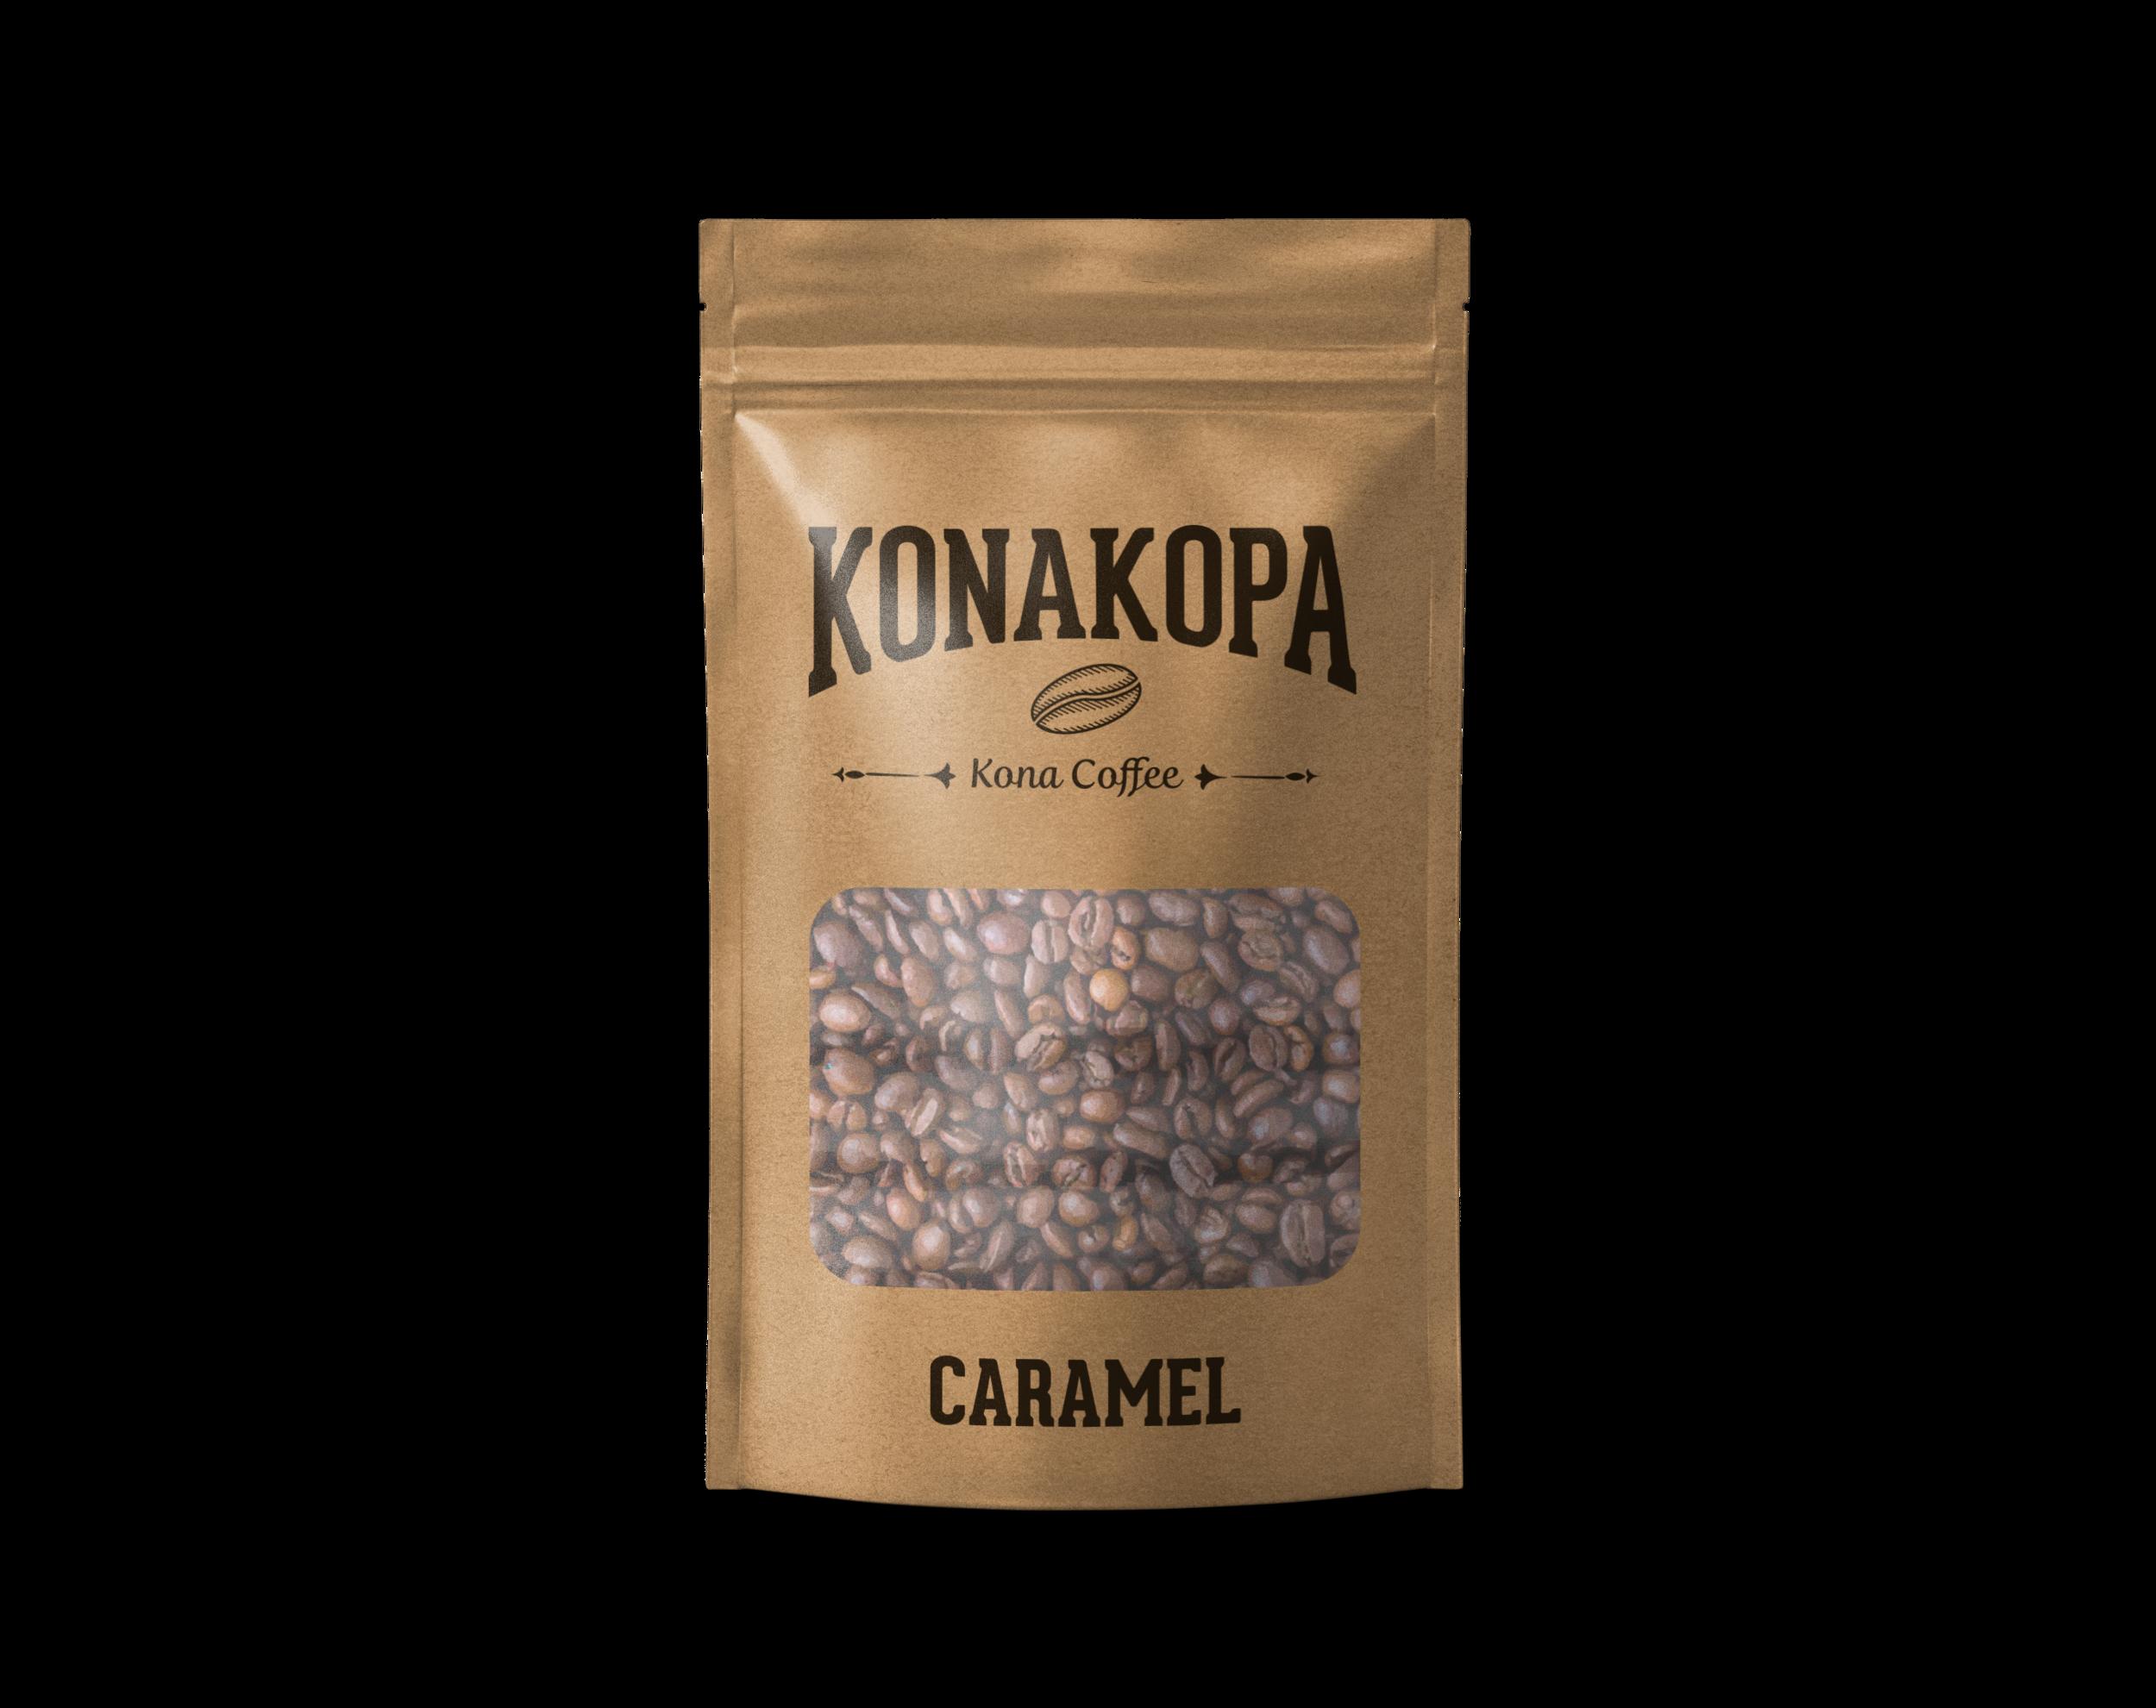 konakopa caramel package.png